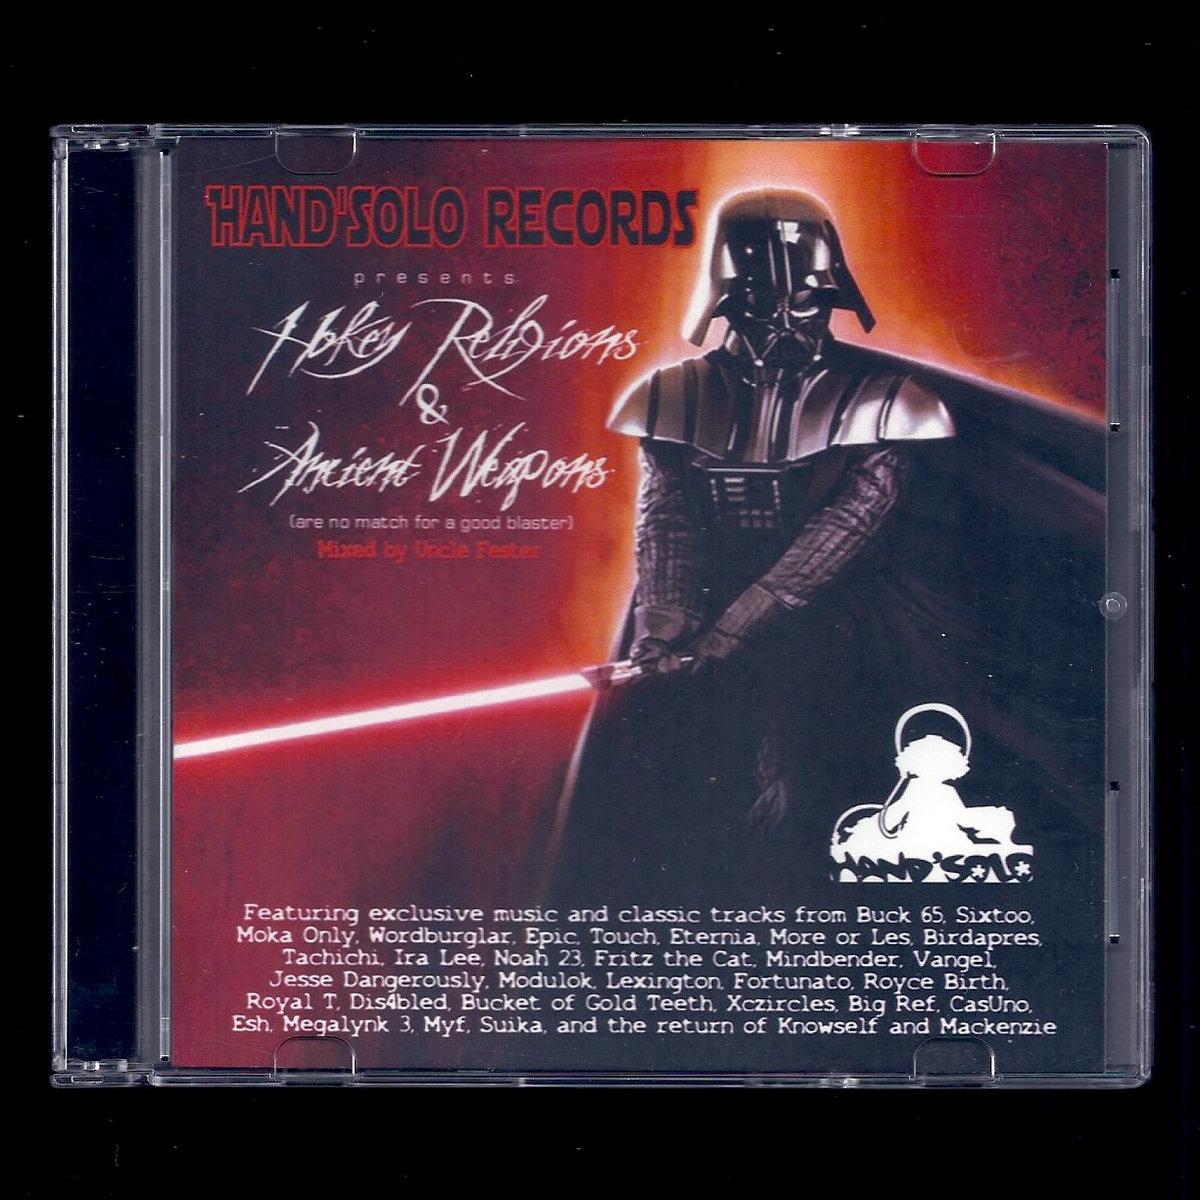 star wars ost mp3 download